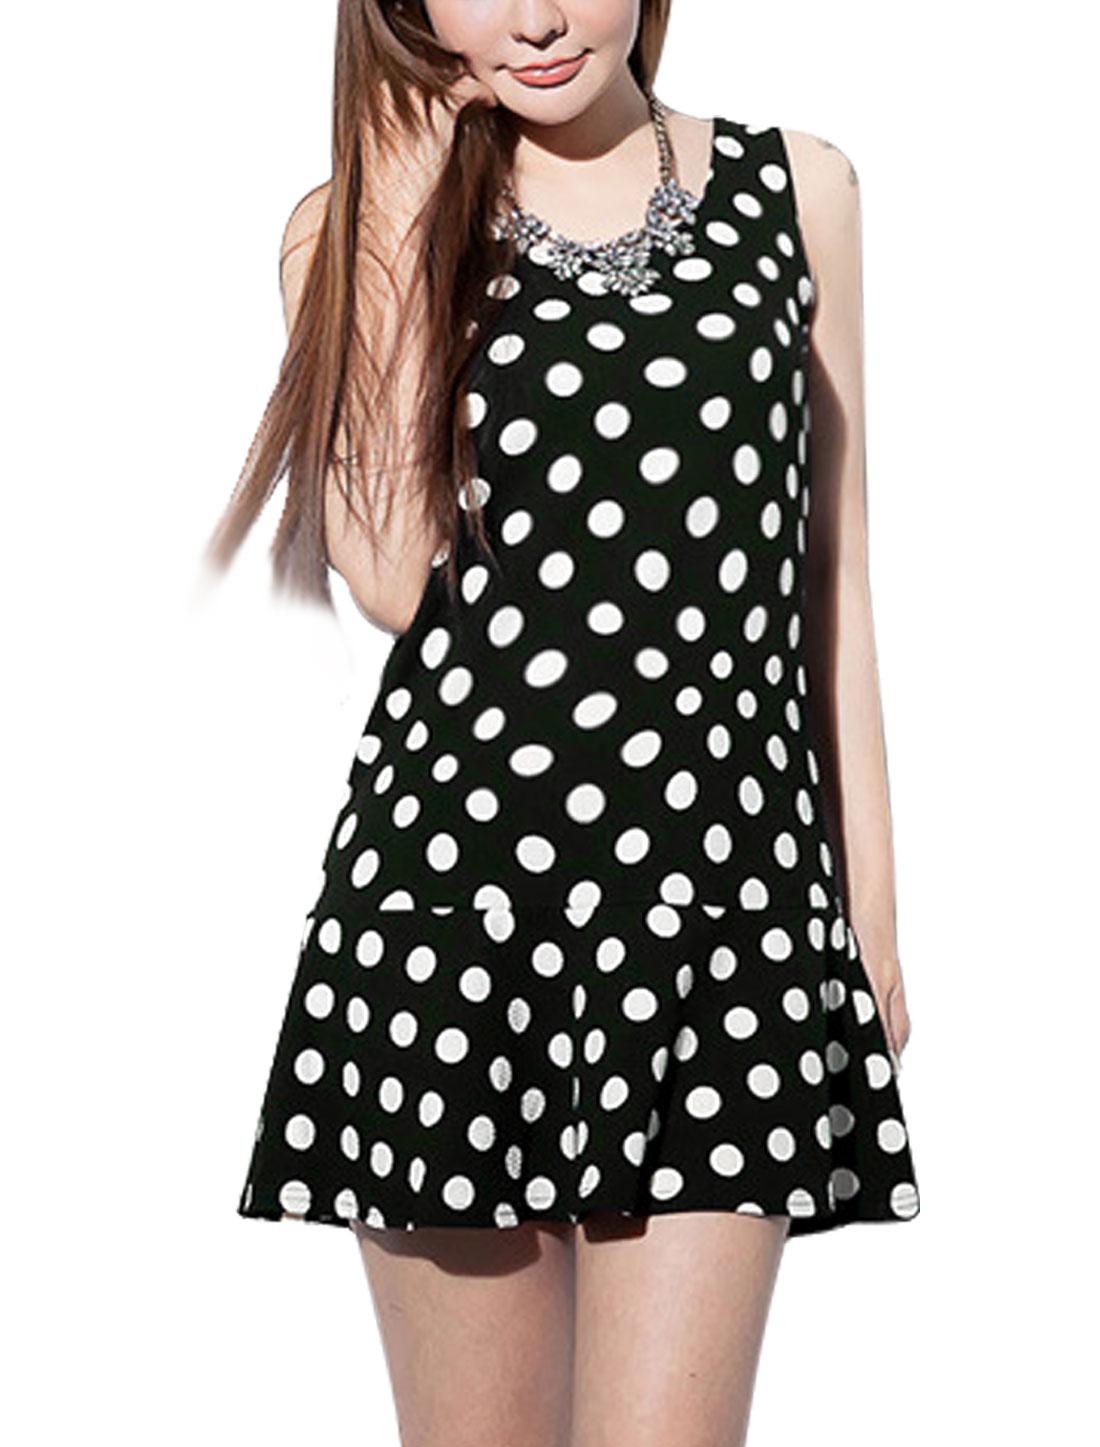 Women Casual Round Neck Sleeveless Dots Prints Peplum Top Black S